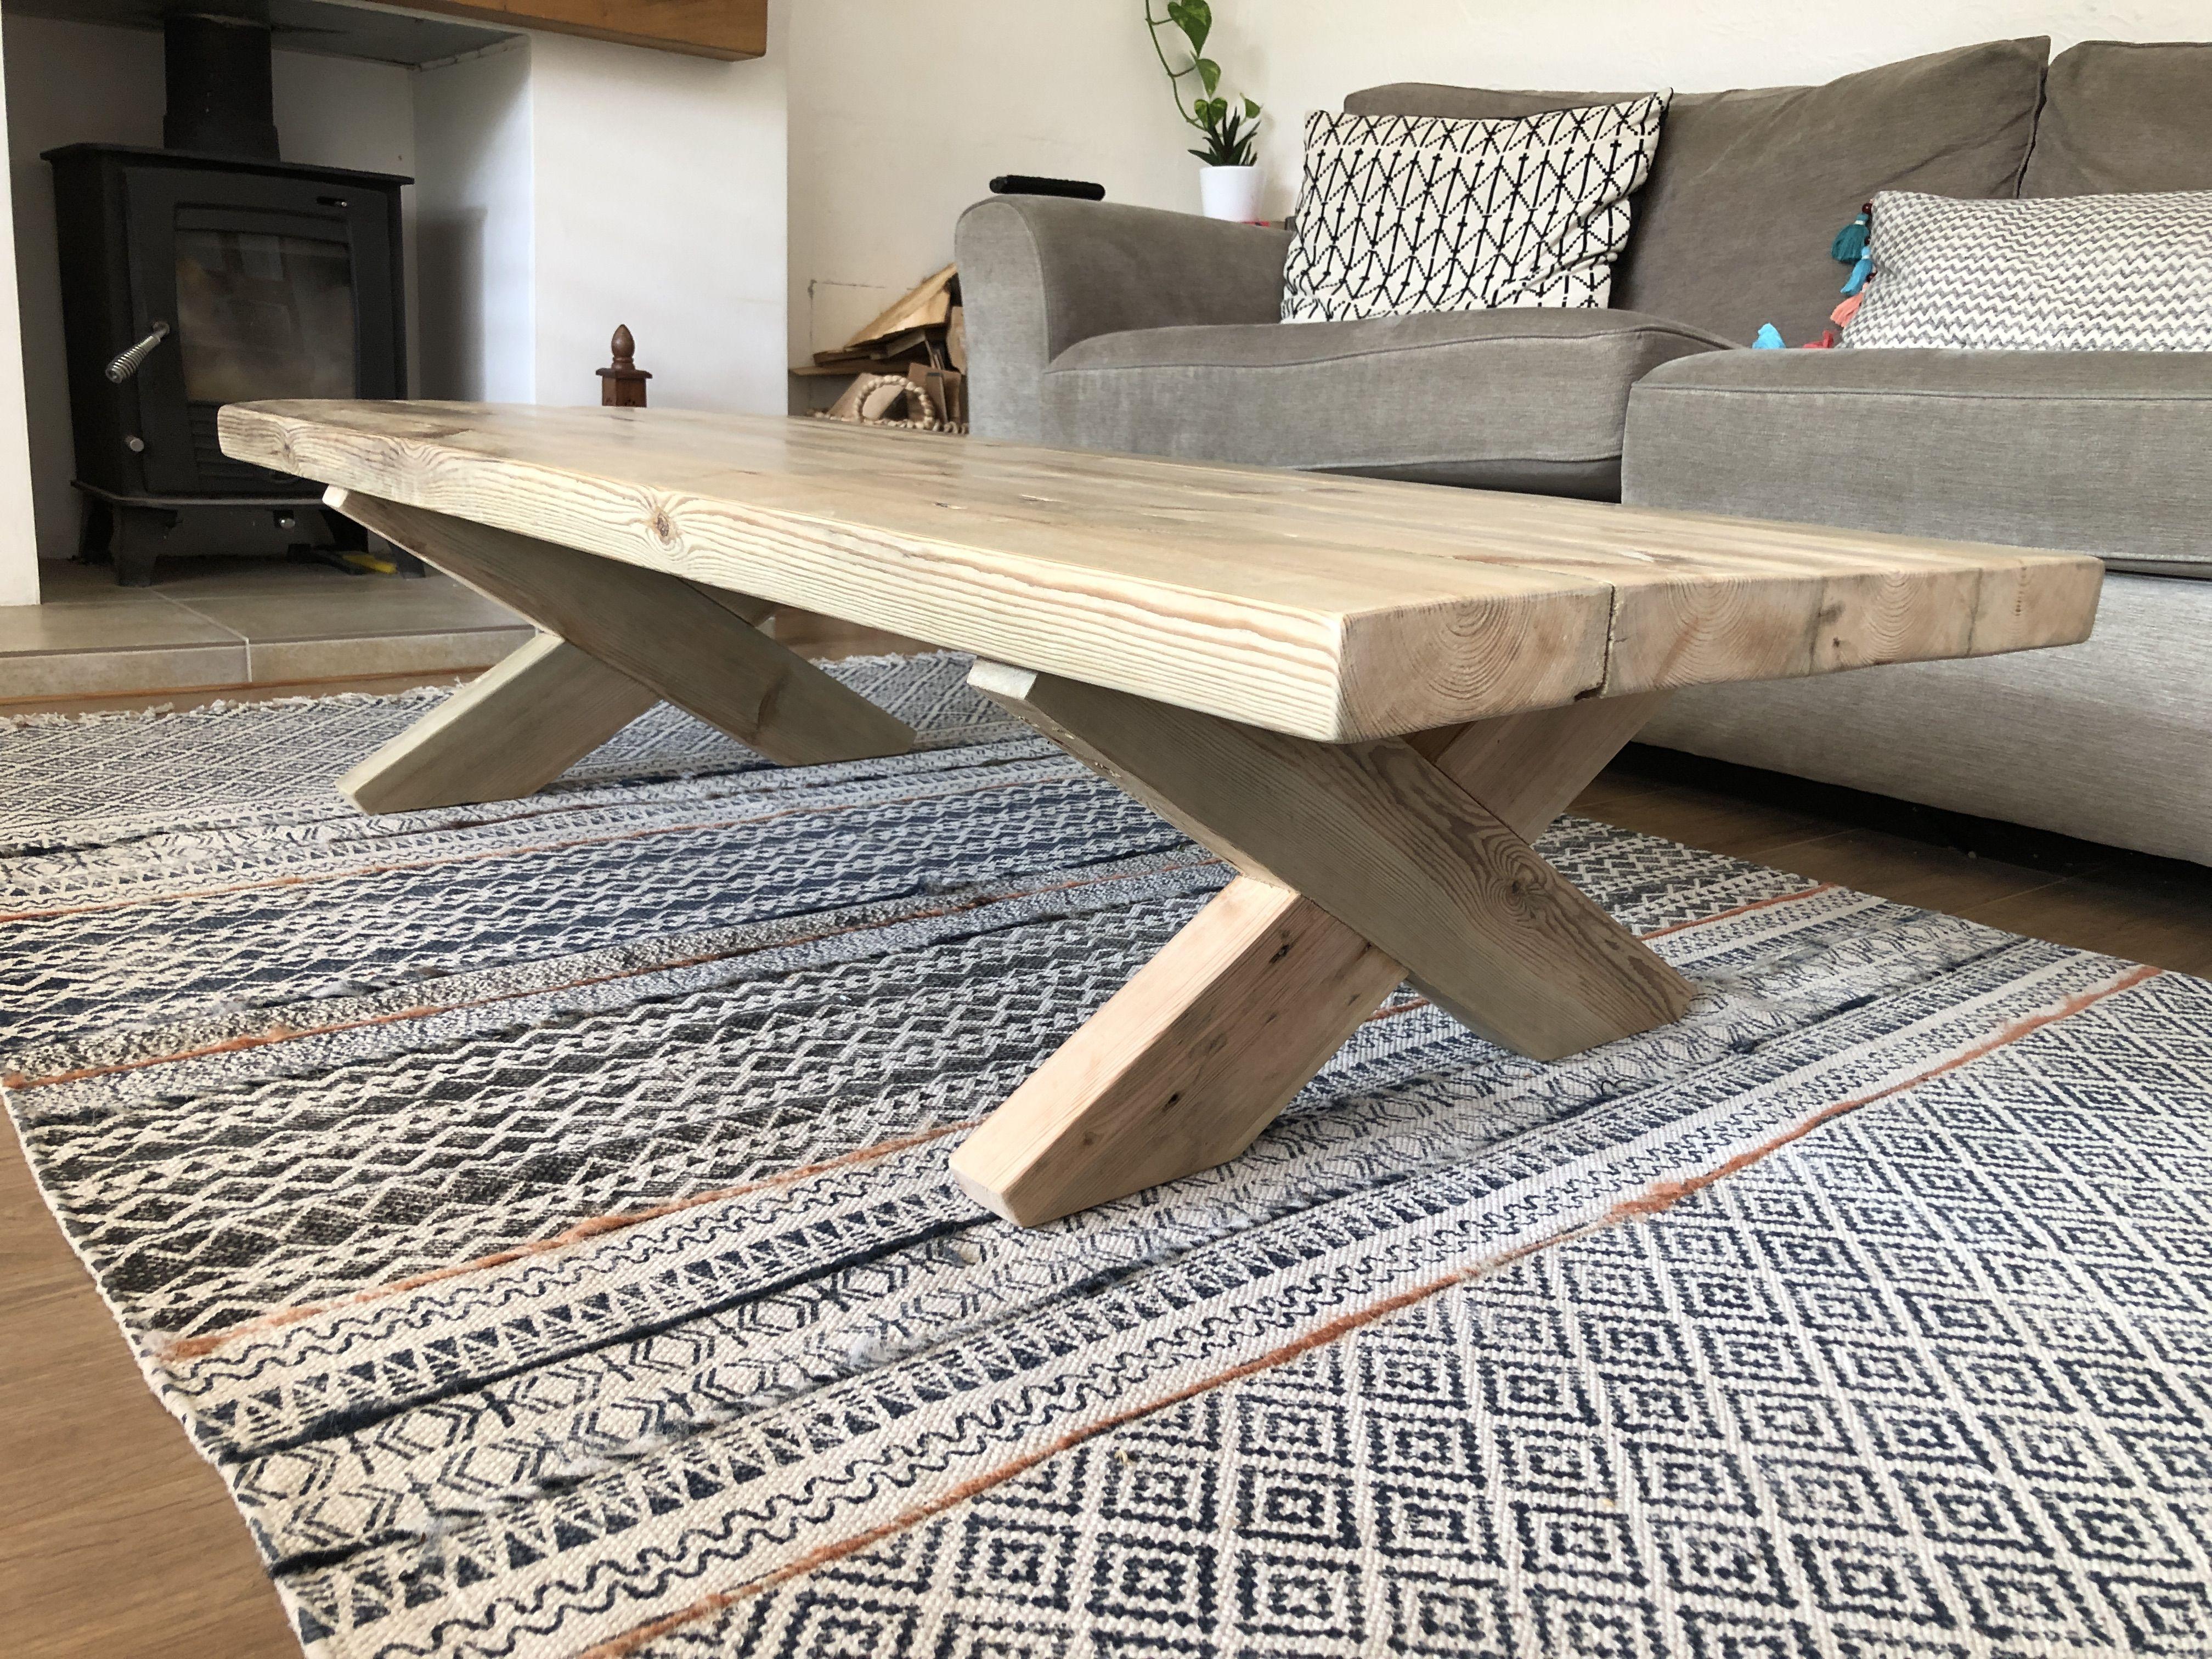 Super Chunky Rustic Coffee Table Rustic Coffee Tables Handmade Coffee Table Coffee Table [ 3024 x 4032 Pixel ]